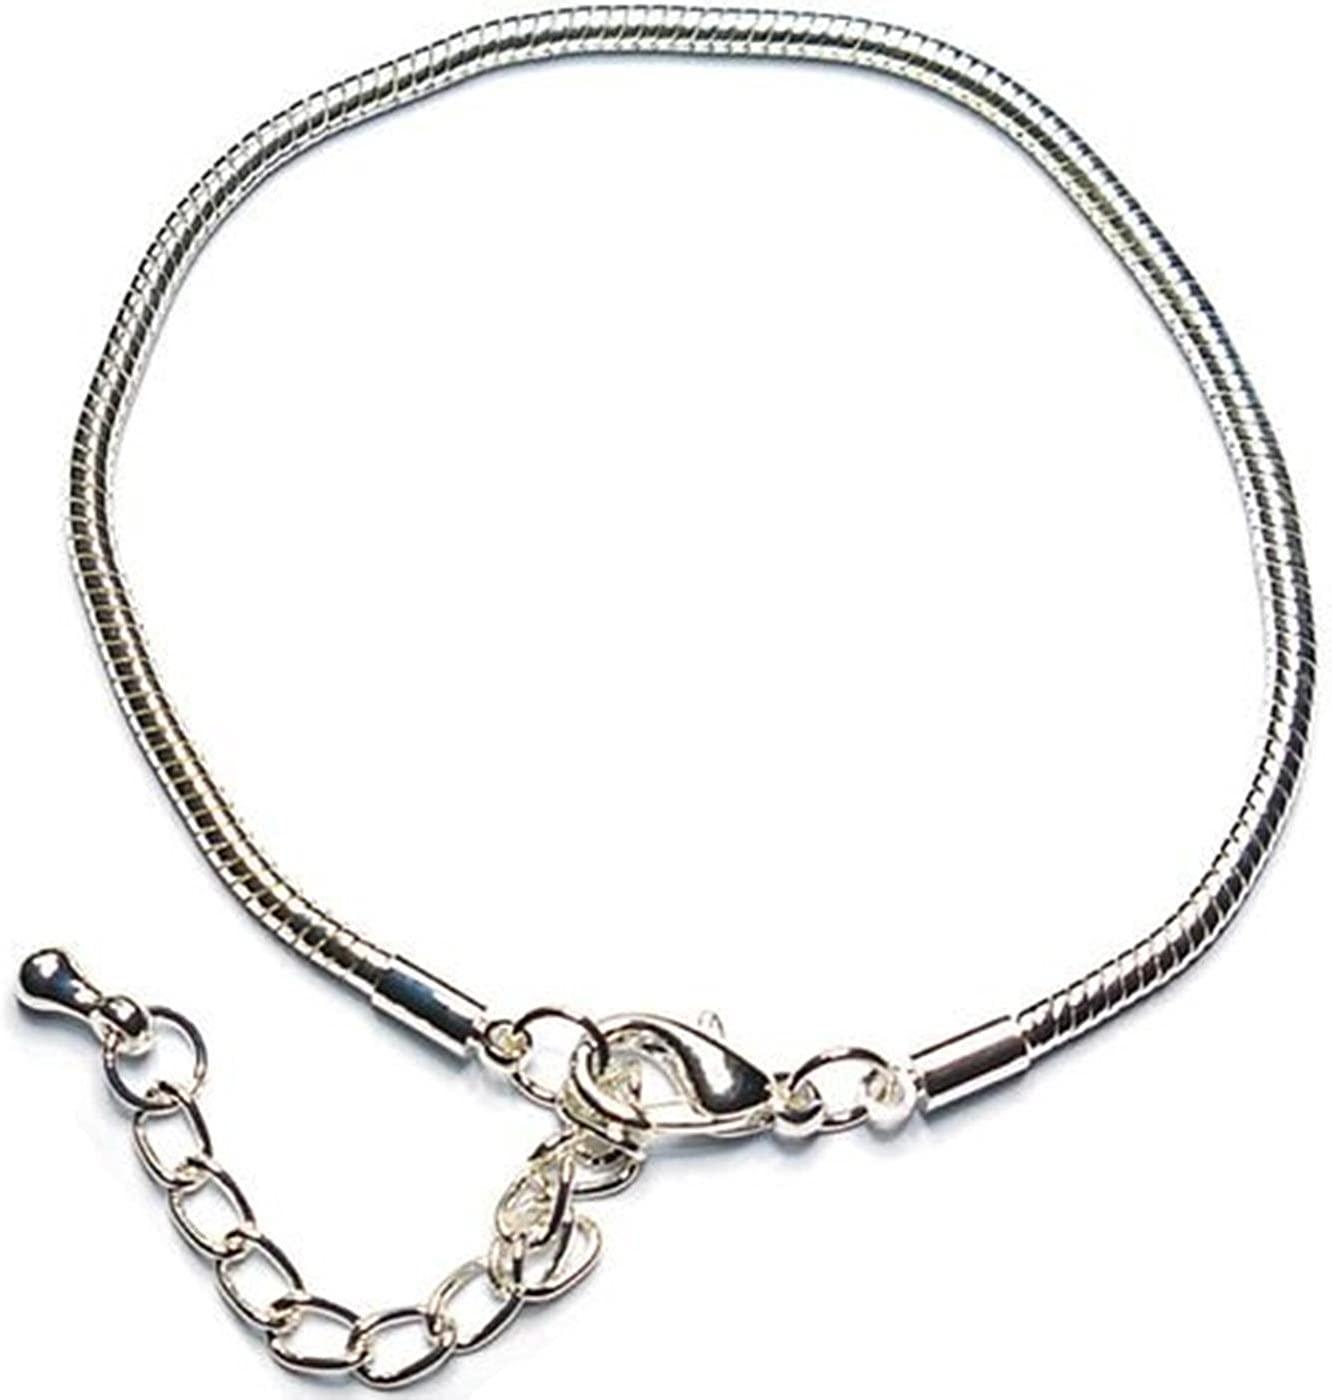 Charm Buddy 20cm Lobster Clasp Stopper Pandora Style Bracelet Fits Charms Beads